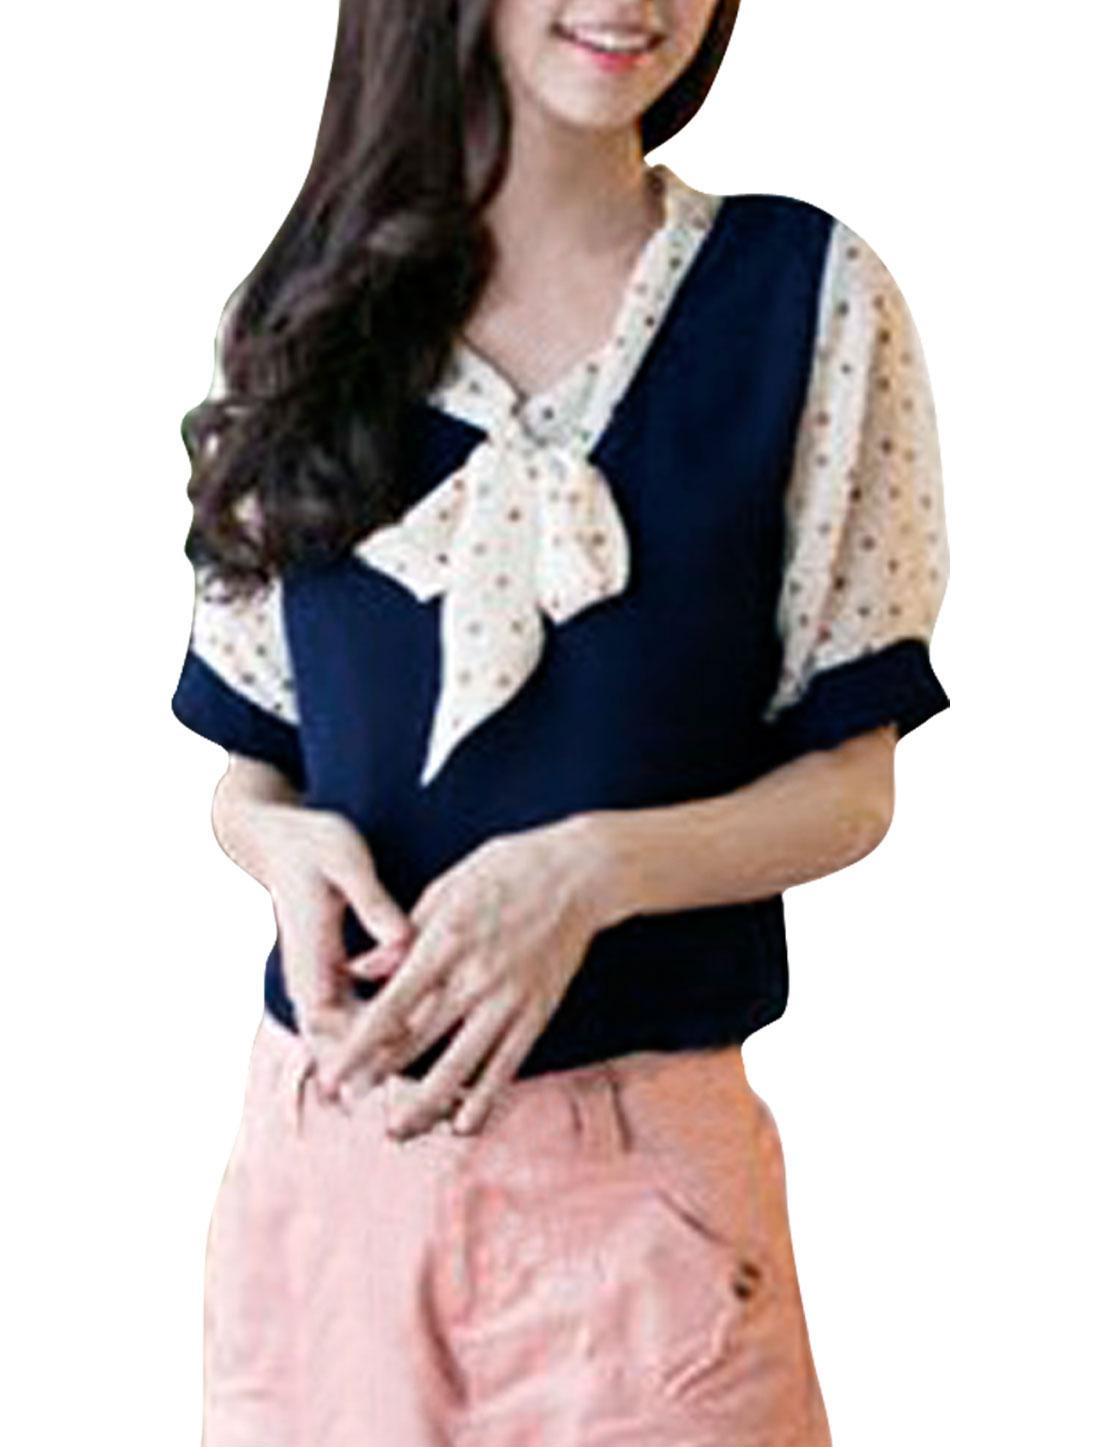 Ladies Navy Blue Short Sleeves Dots Pattern Semi Sheer Summer Shirt XS